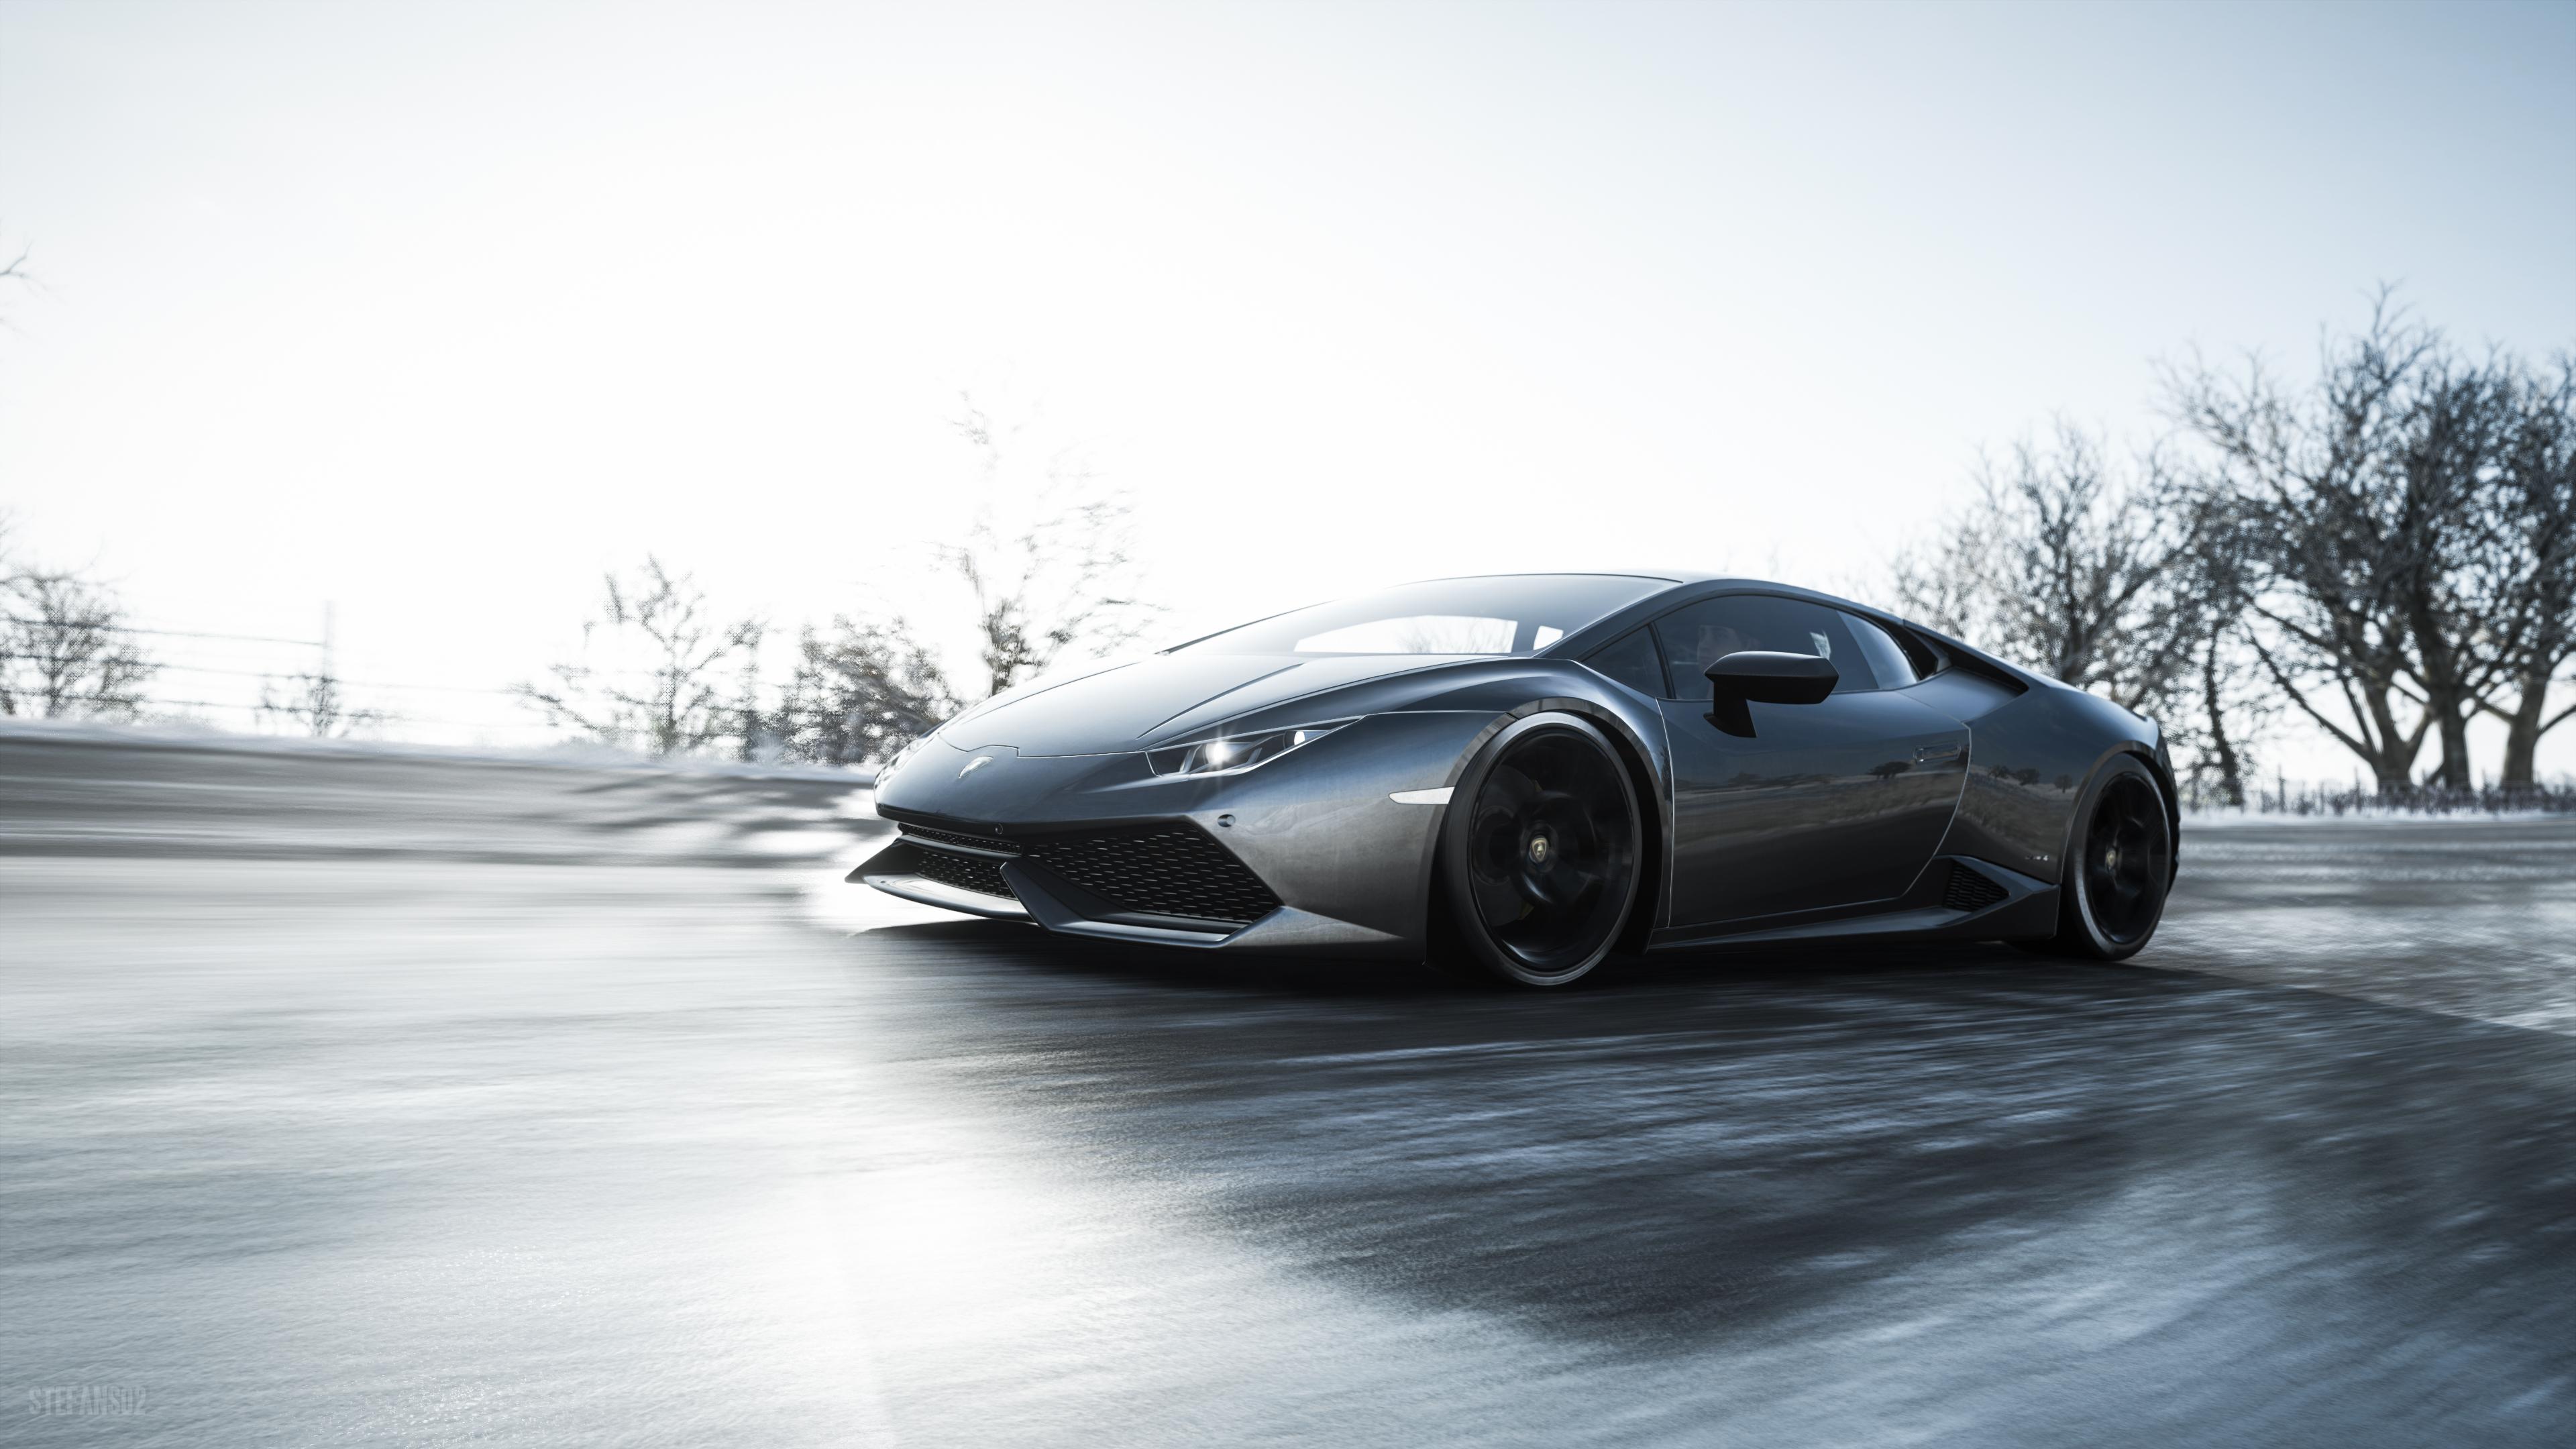 forza horizon 4 lamborghini huracan lp 610 4 4k 1598657559 - Forza Horizon 4 Lamborghini Huracan LP 610 4 4k -